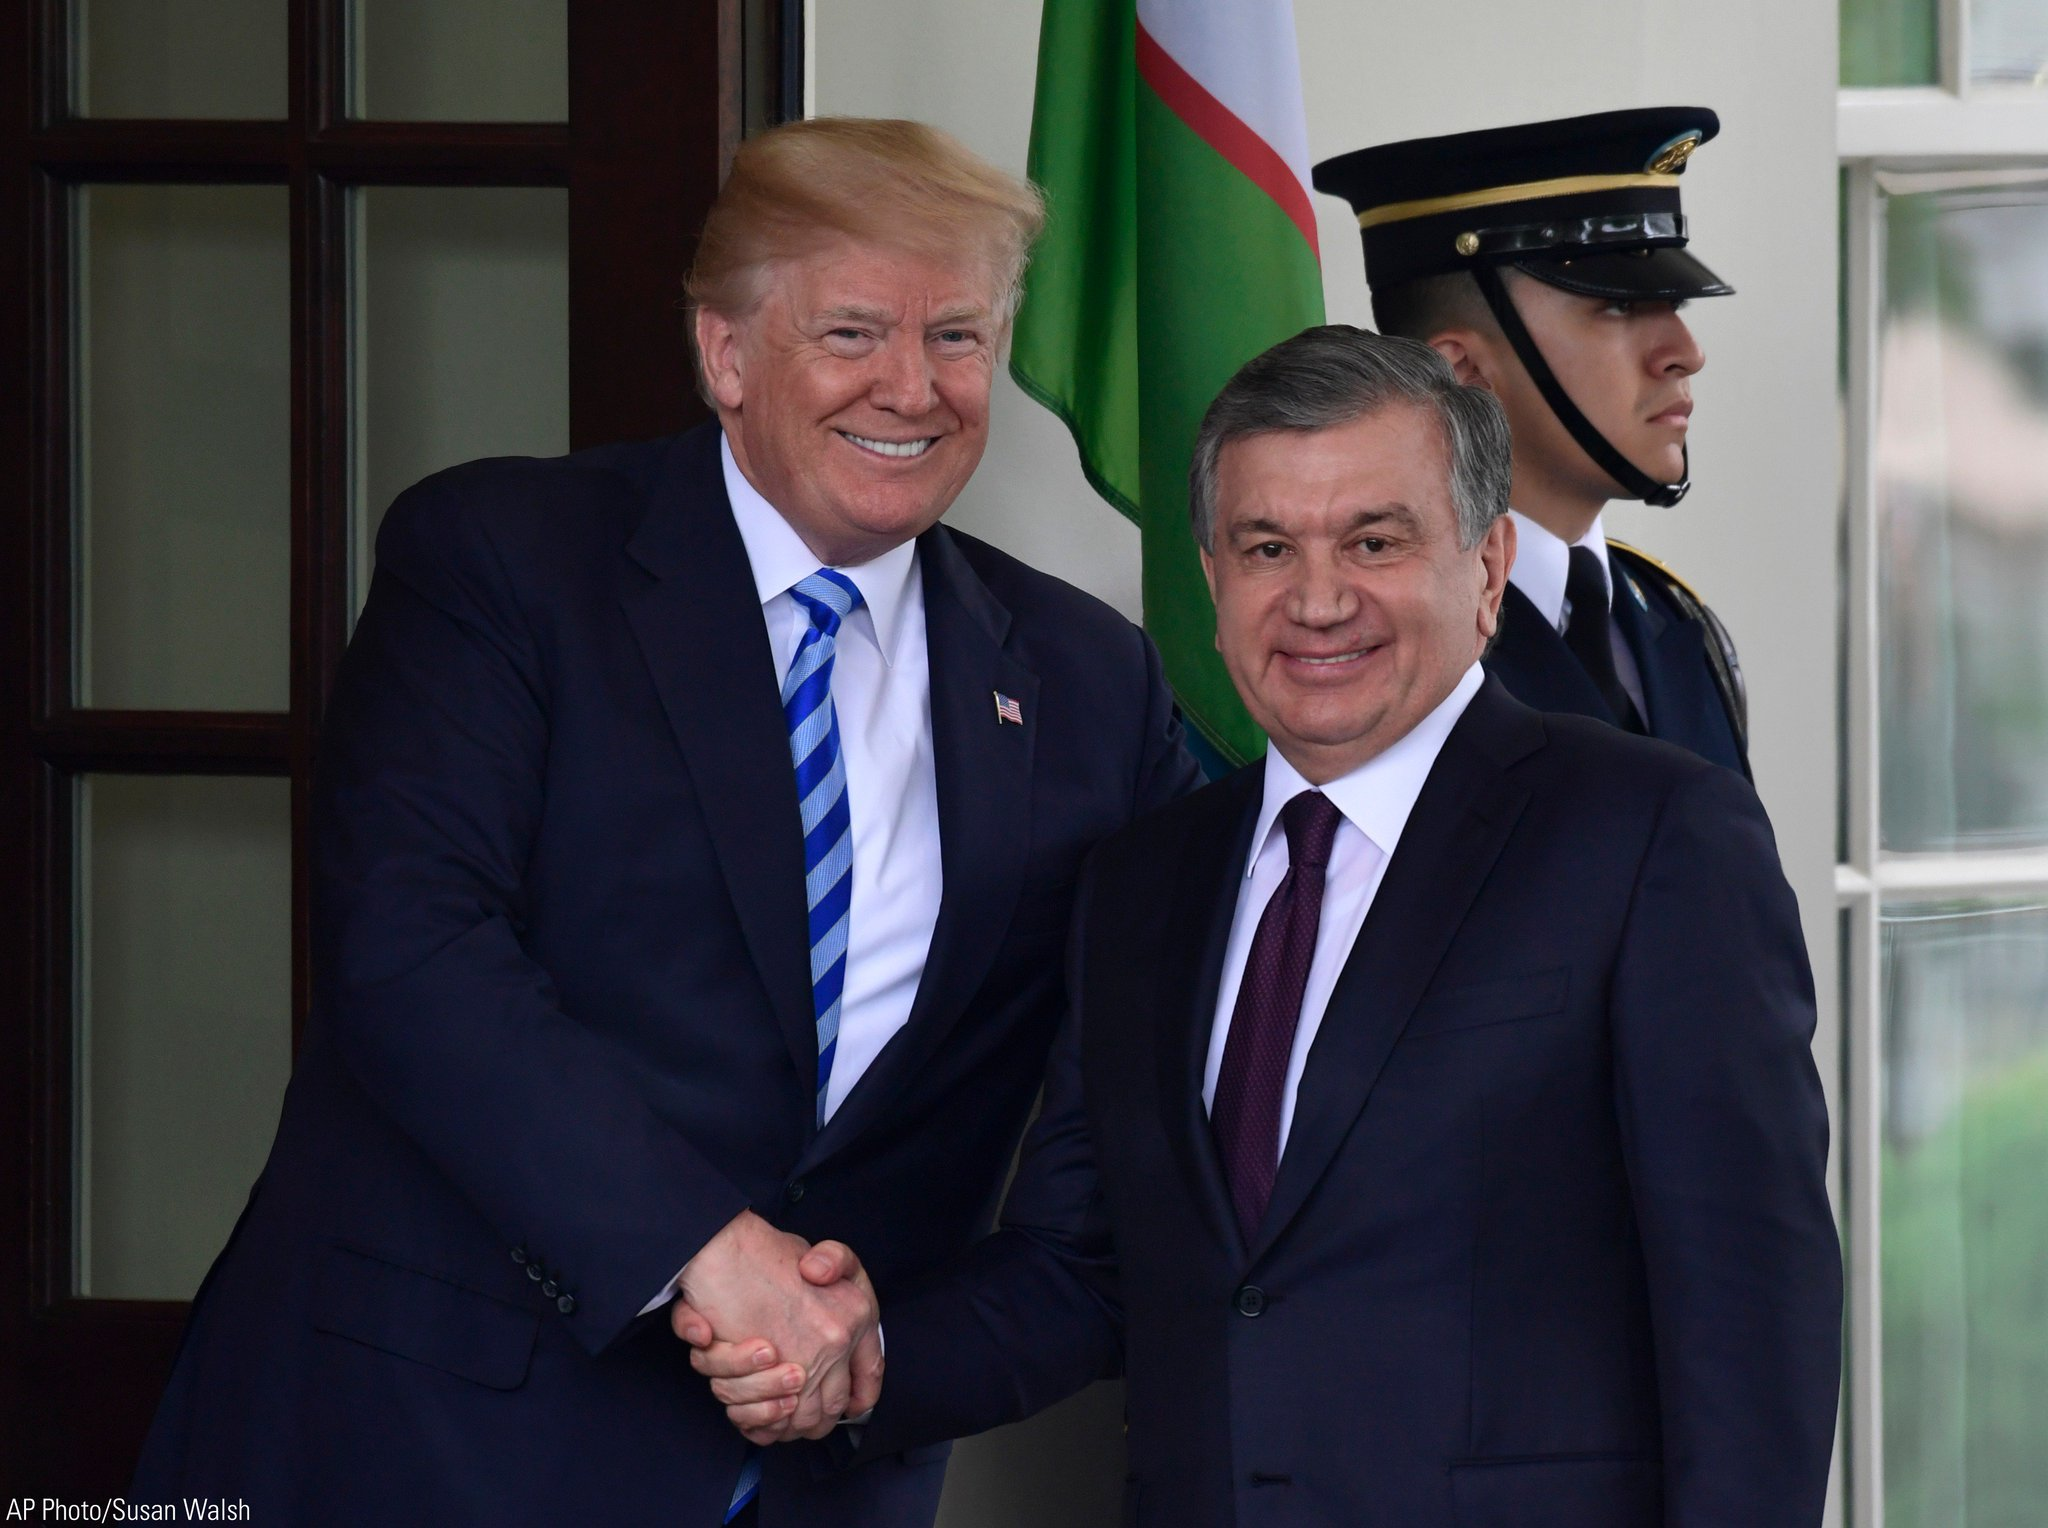 .@POTUS greets the Uzbek President Shavkat Mirziyoyev outside the West Wing of the @WhiteHouse https://t.co/BgOxz0RMId